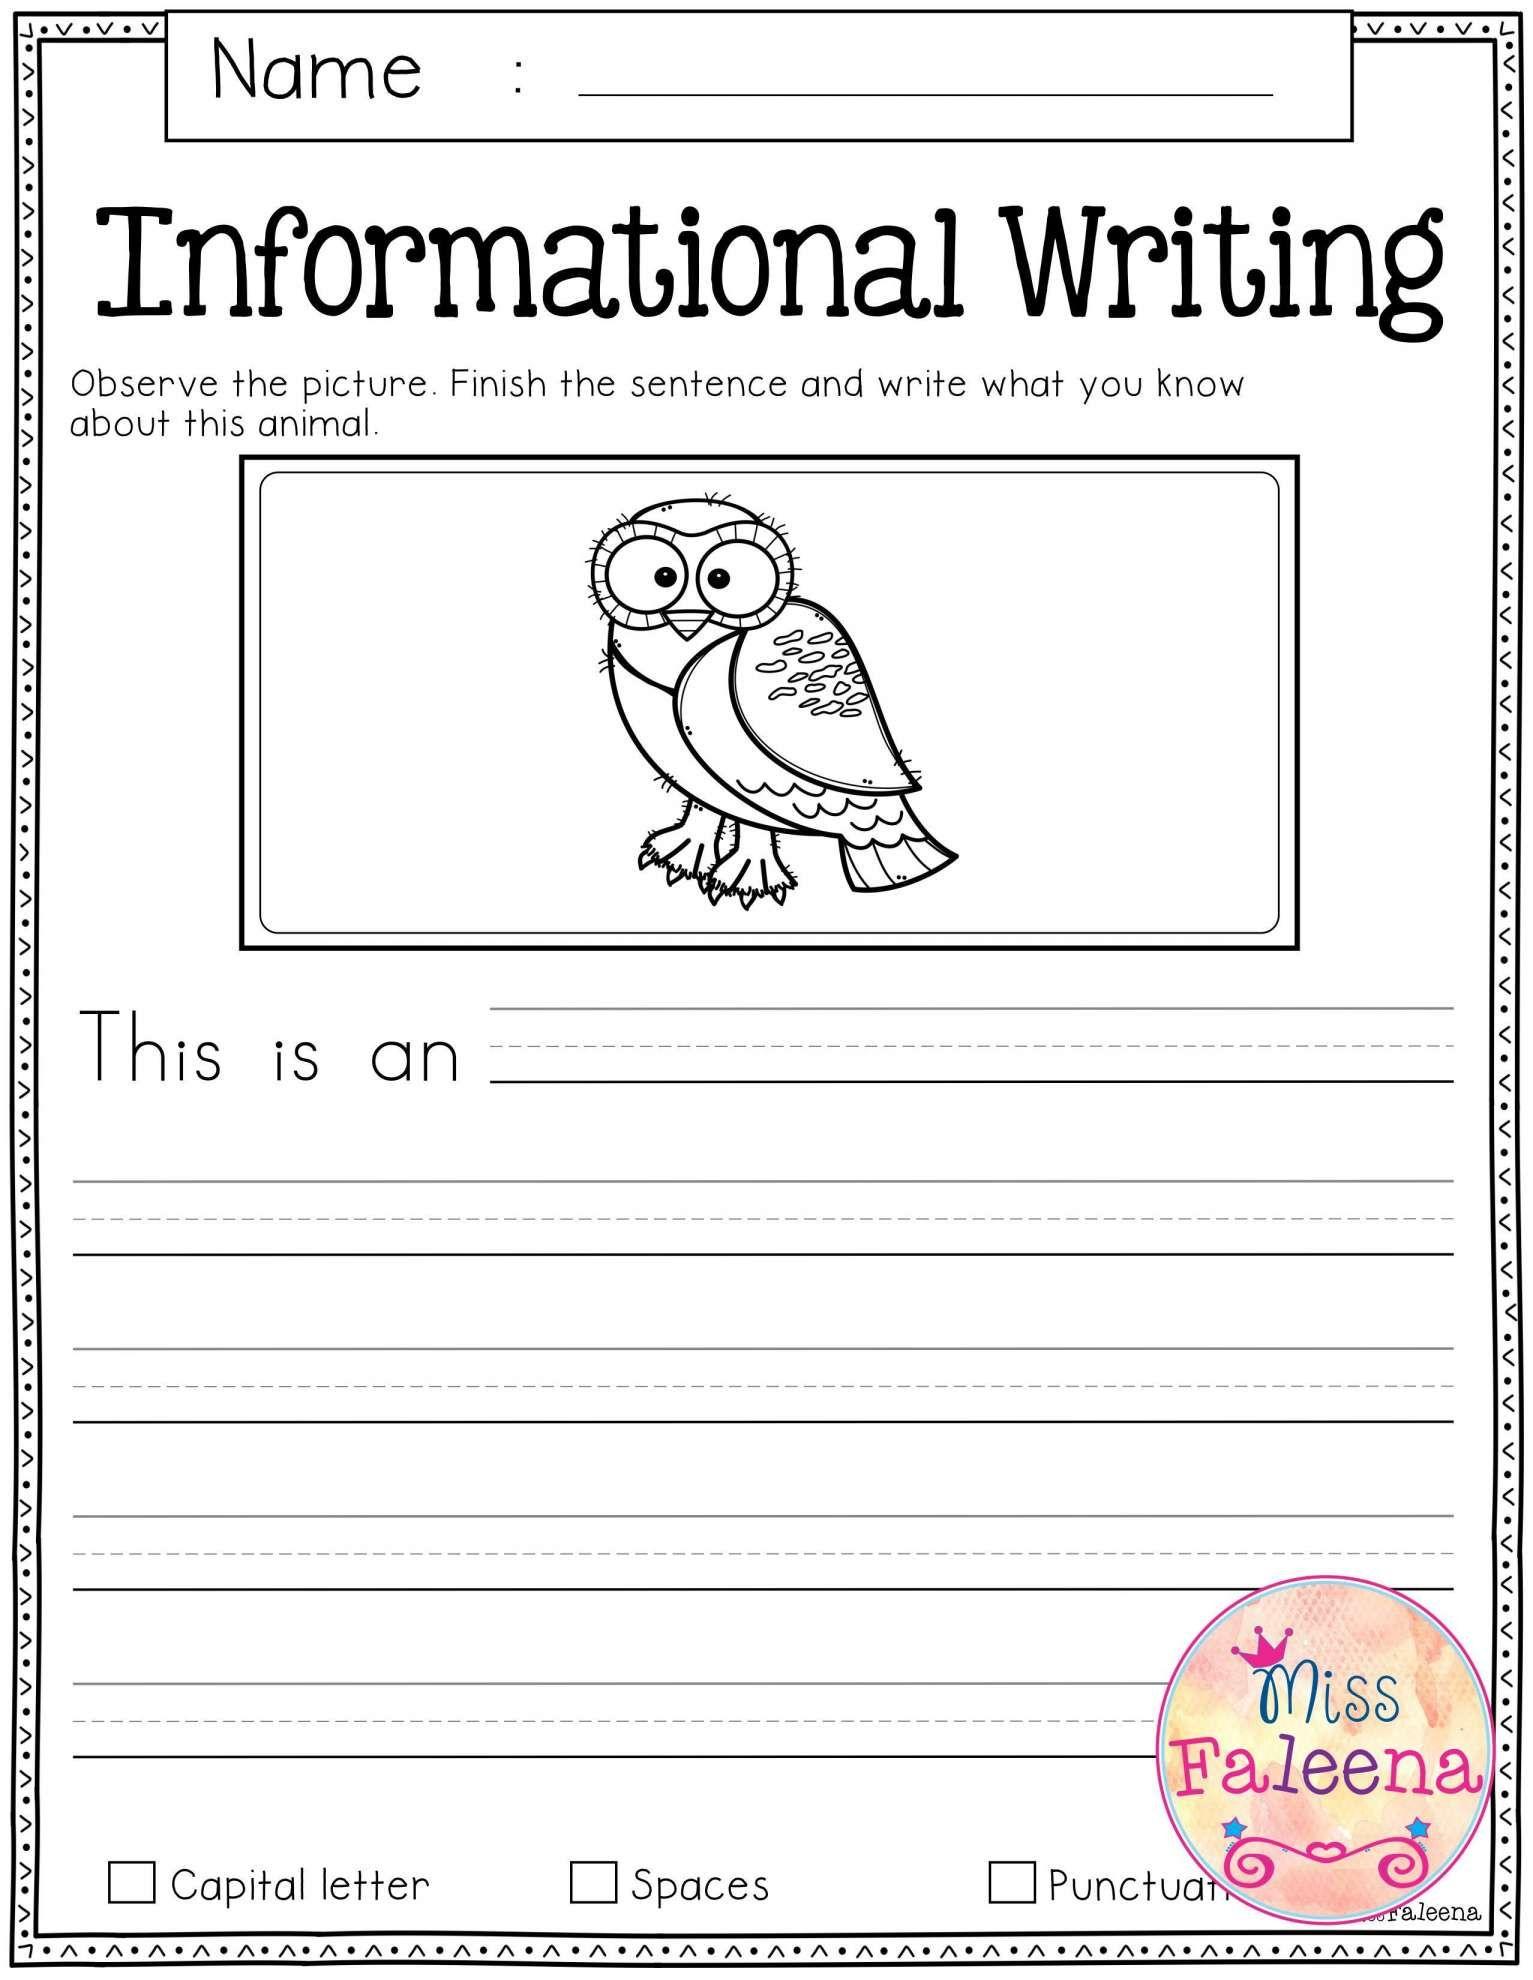 10 Writing Prompt Worksheet For Kindergarten